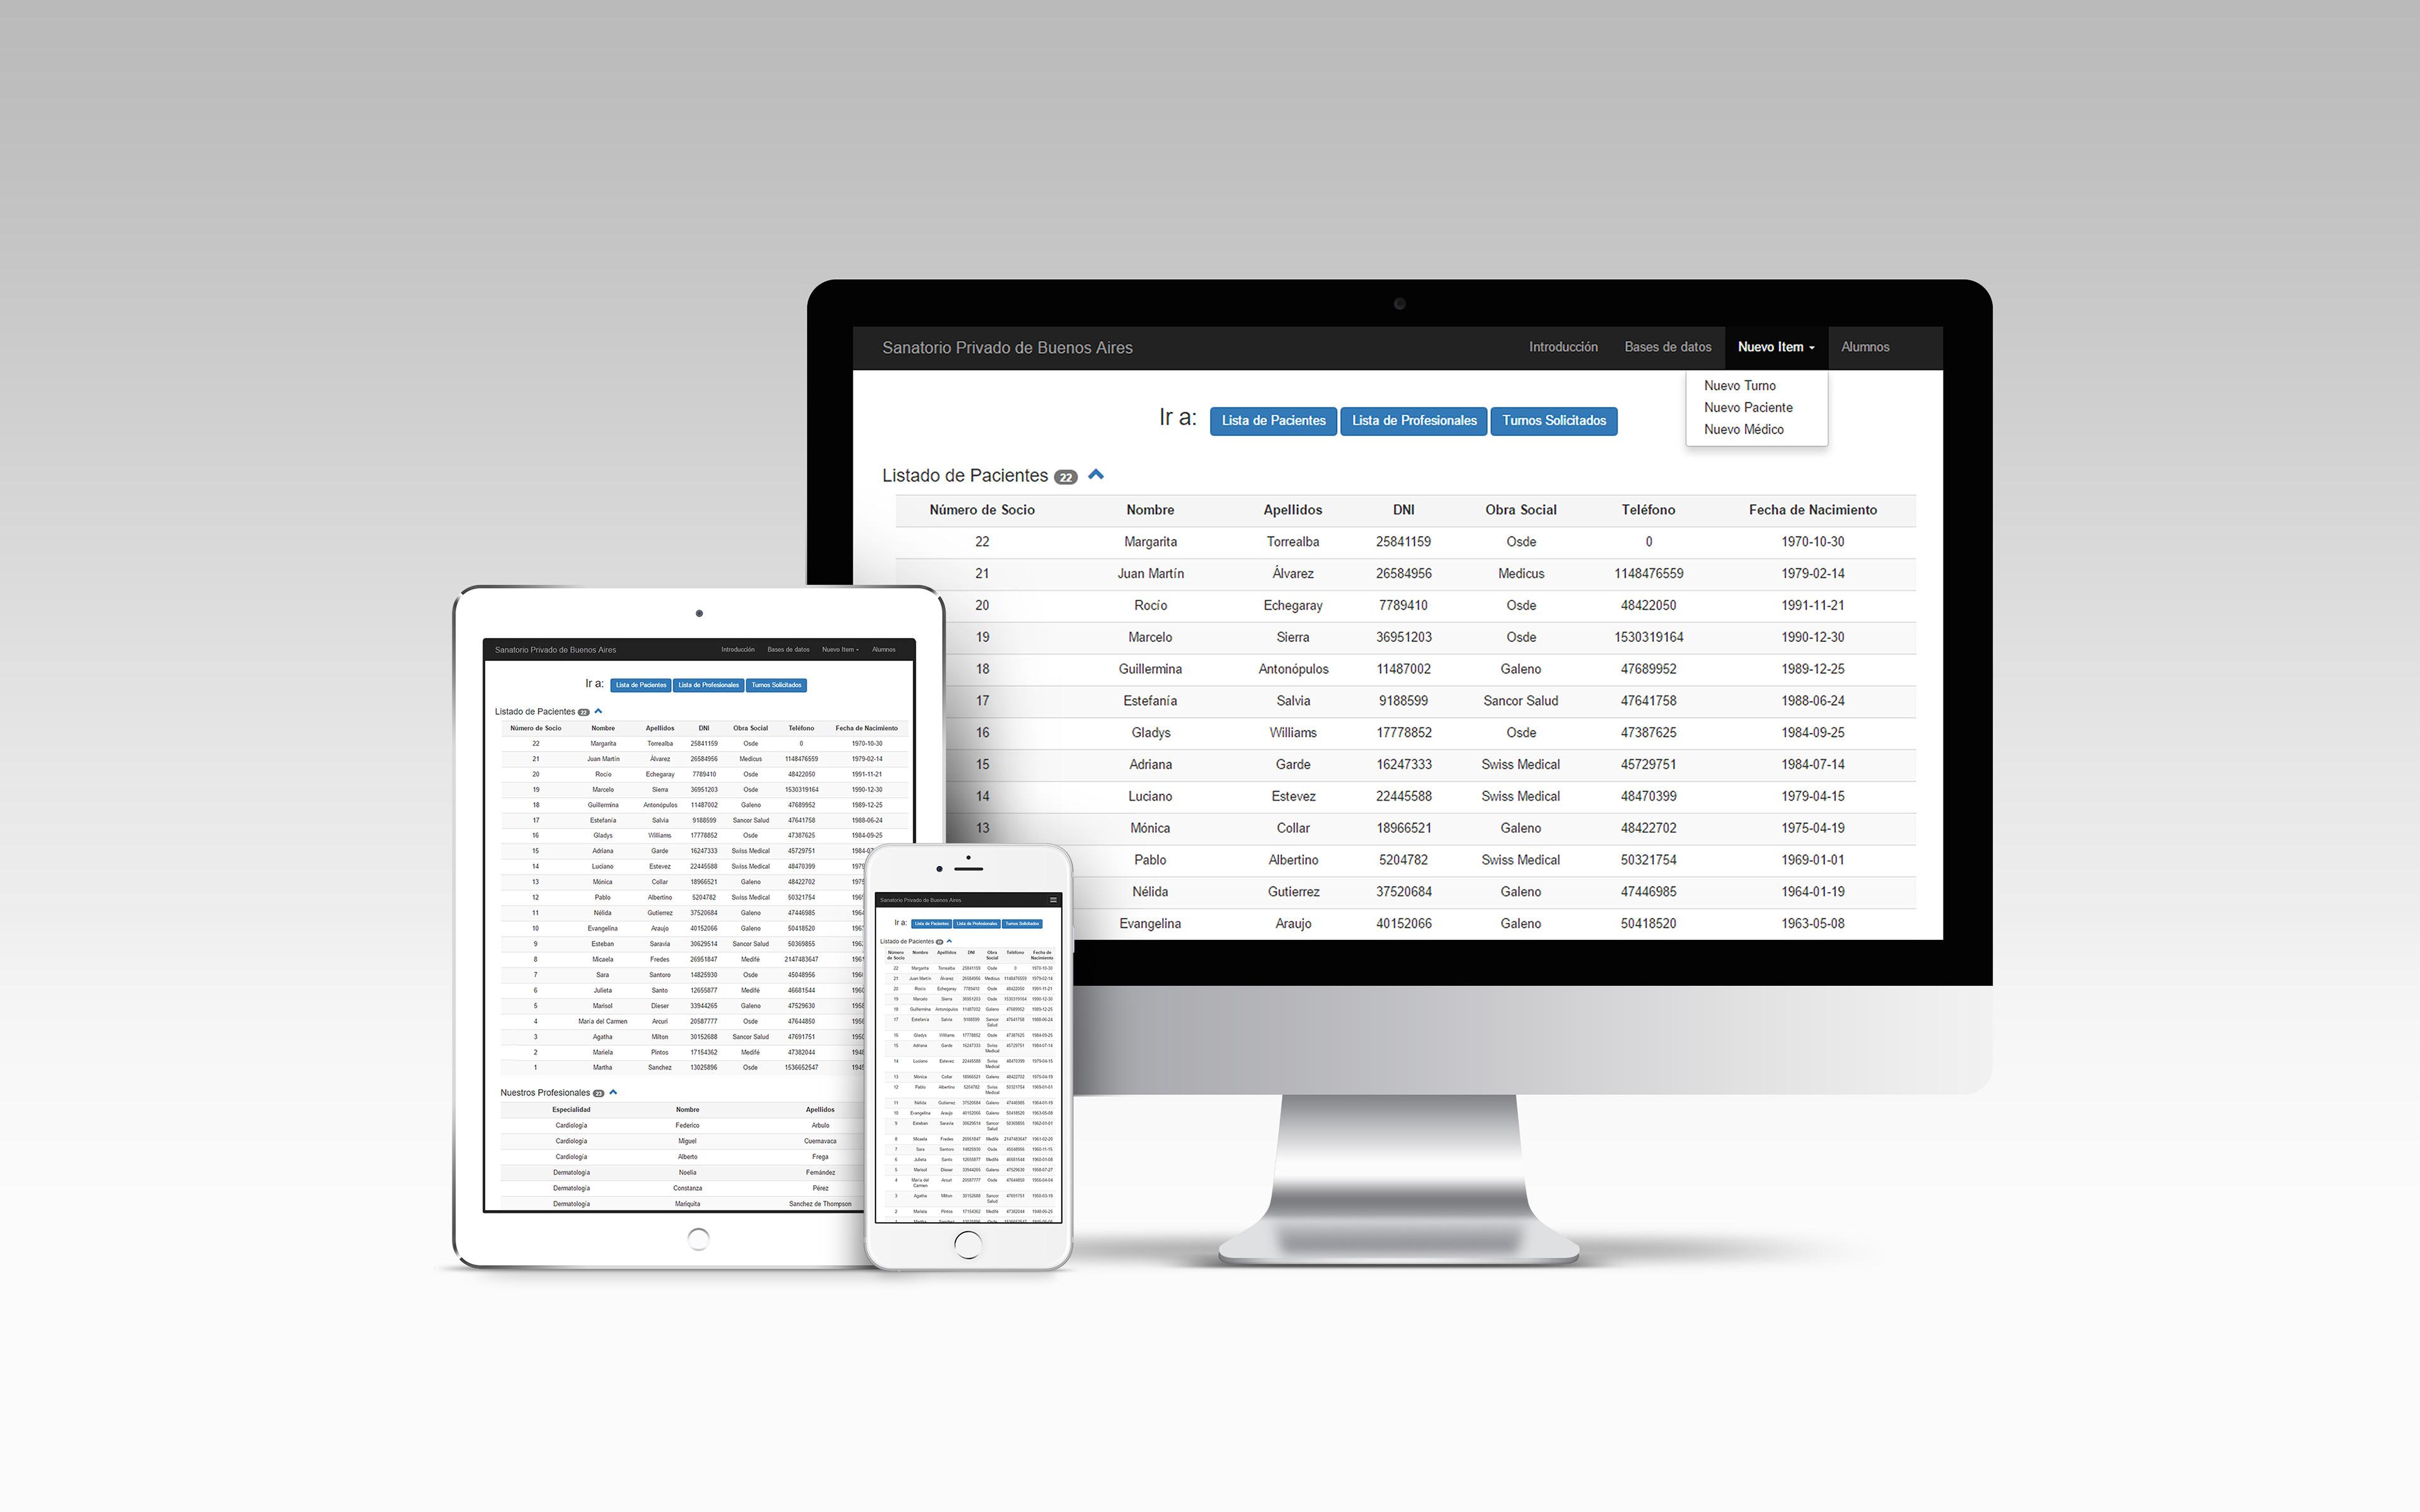 Emanuel Jalil - Web diseñada con Bootstrap. Base de Datos SQL + PHP